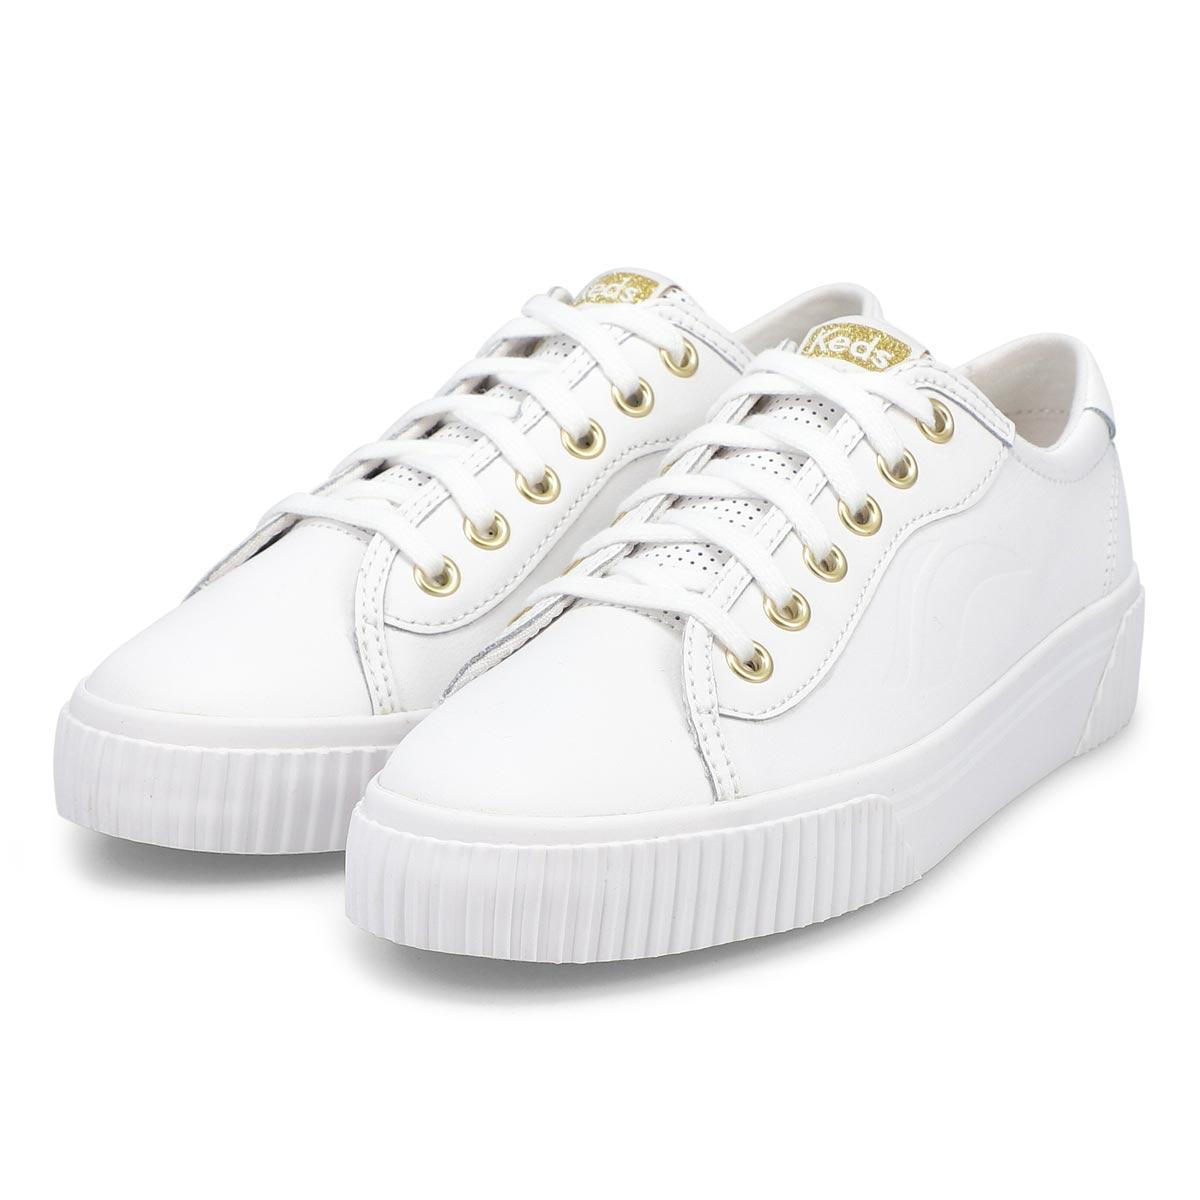 Women's Crew Kick Alto Leather Sneaker -White/Whte